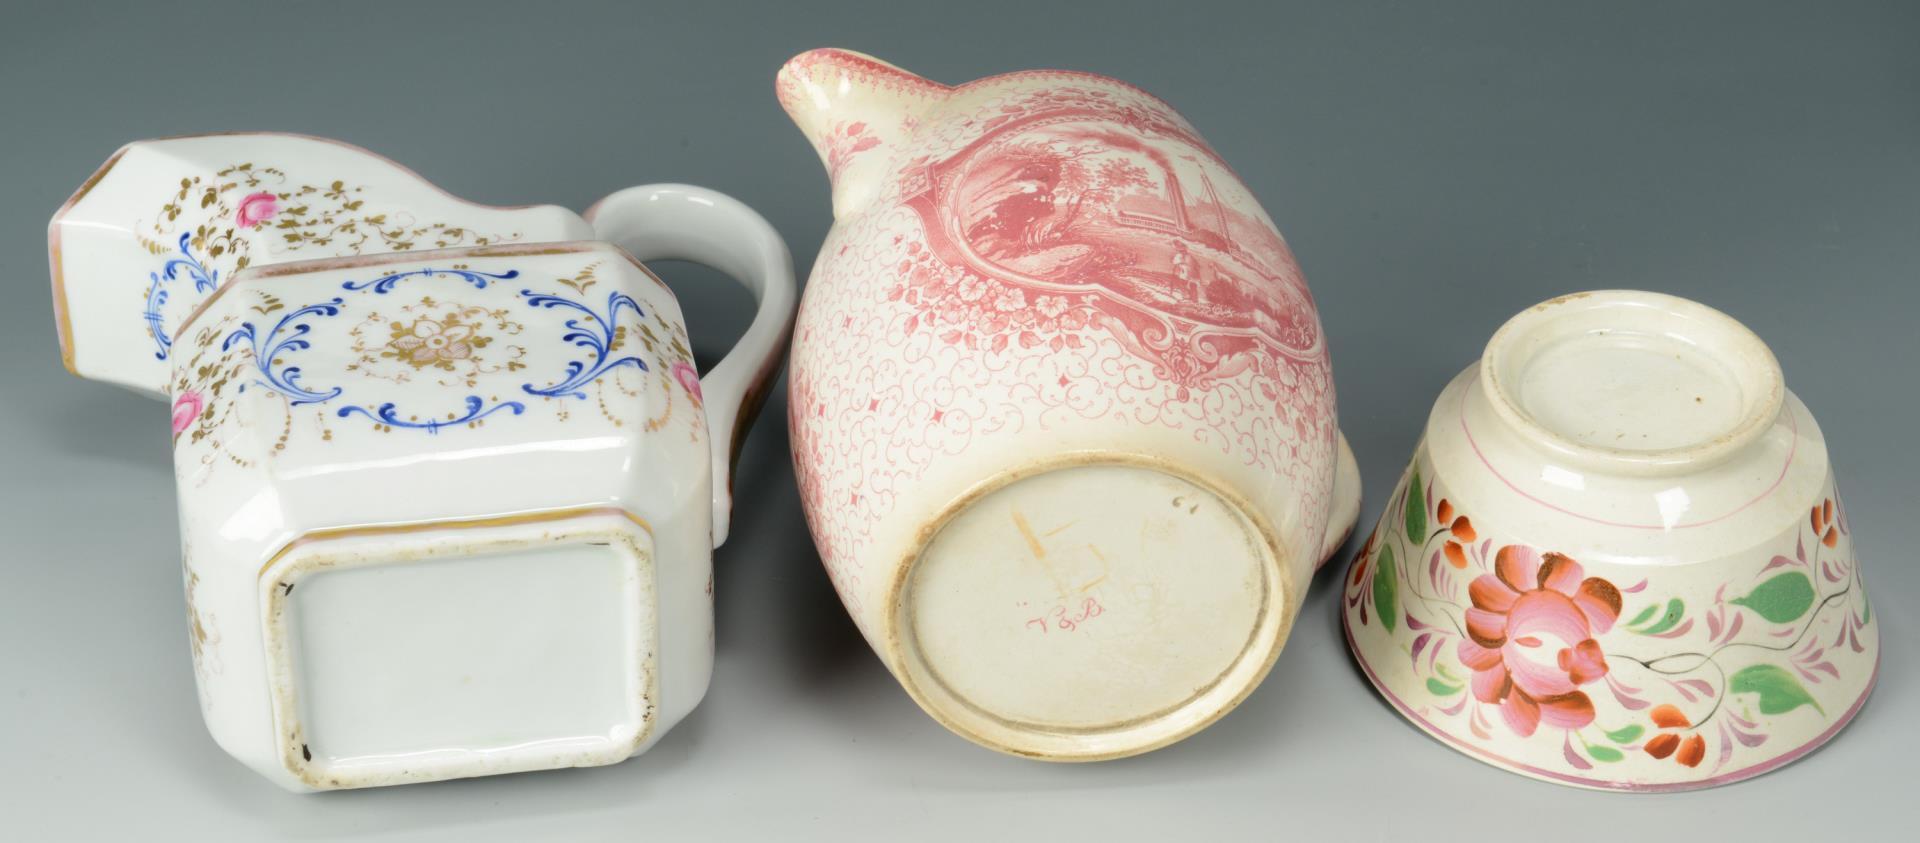 Lot 770: Assembled Group of Ceramics, 14 pcs.